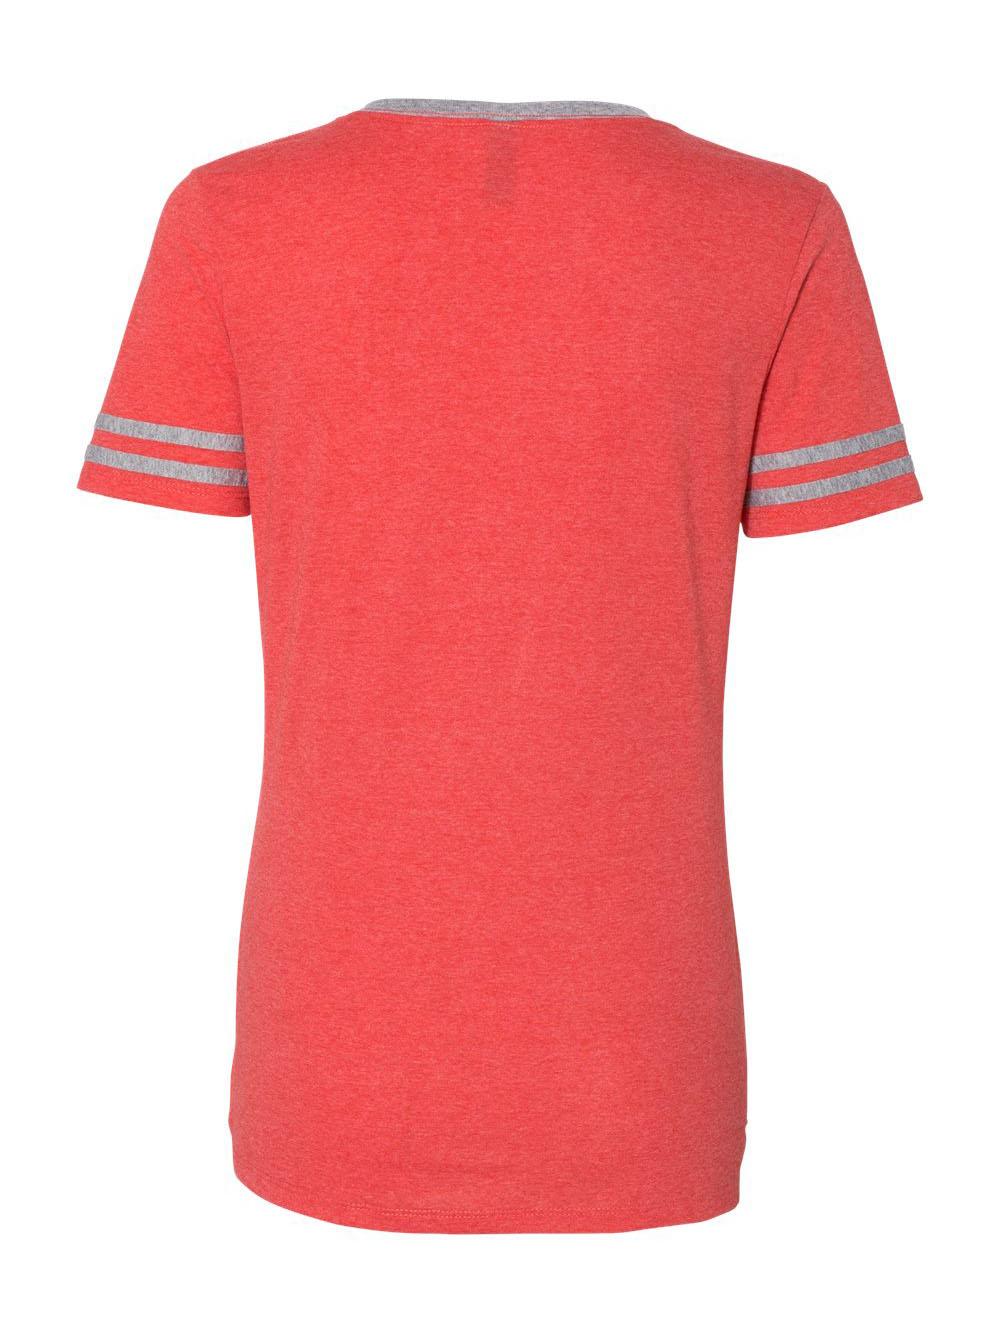 Jerzees-Triblend-Women-039-s-V-Neck-Varsity-T-Shirt-602WVR thumbnail 10